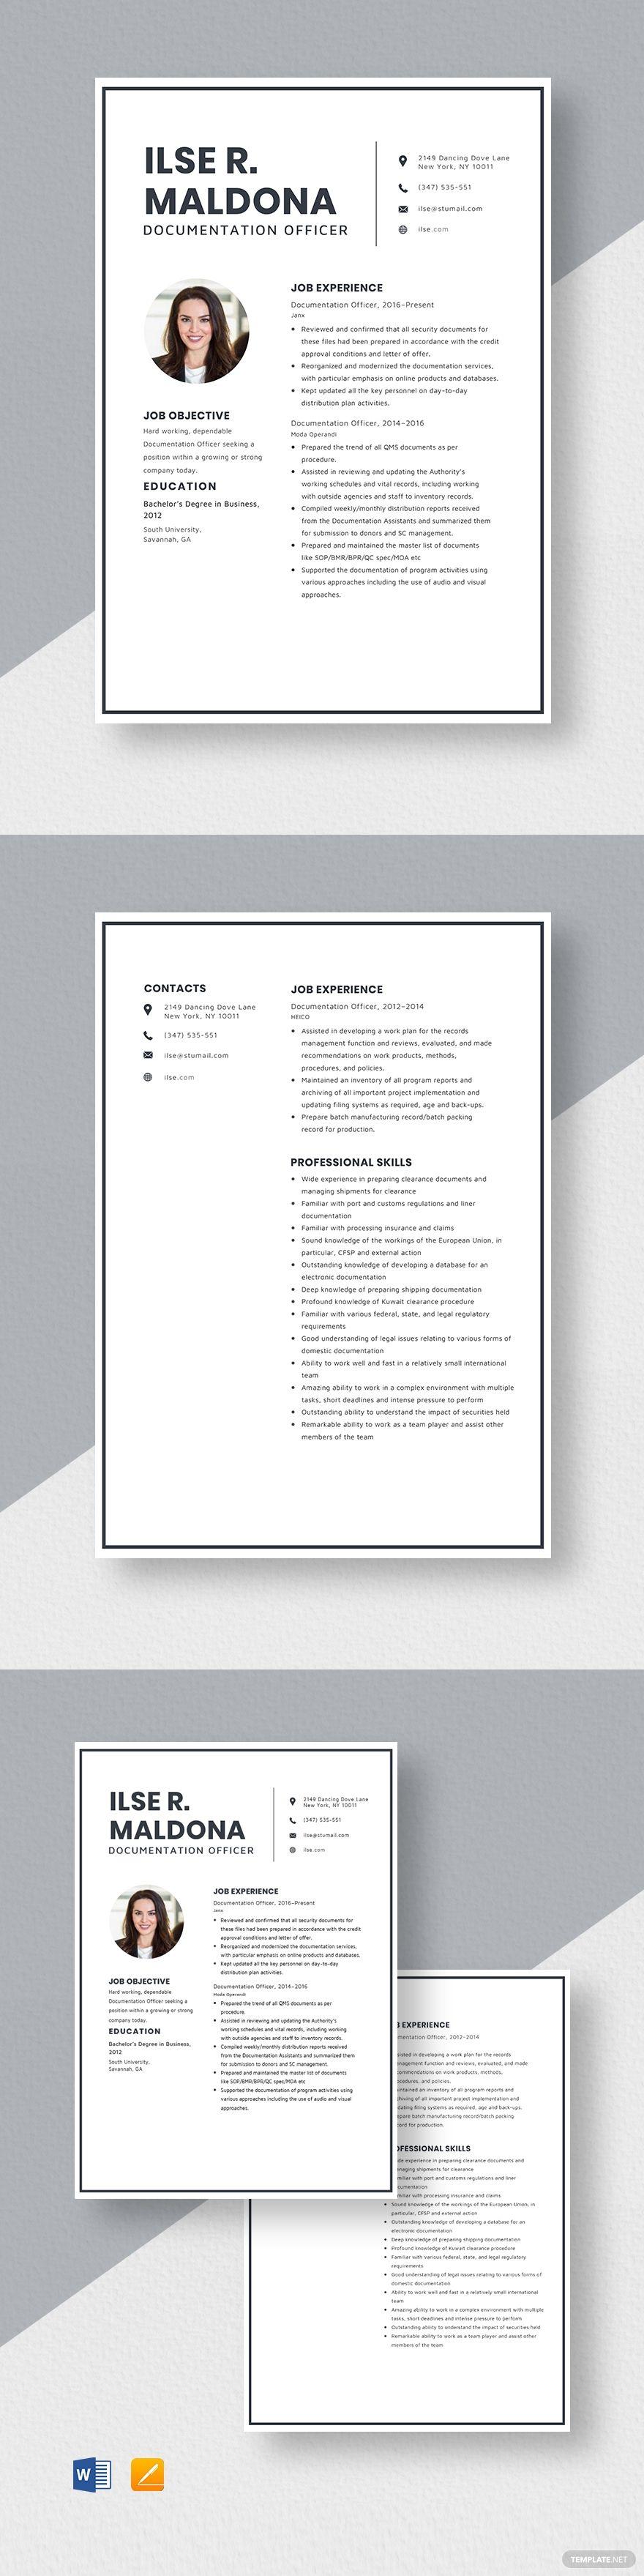 Documentation officer resume resume design template